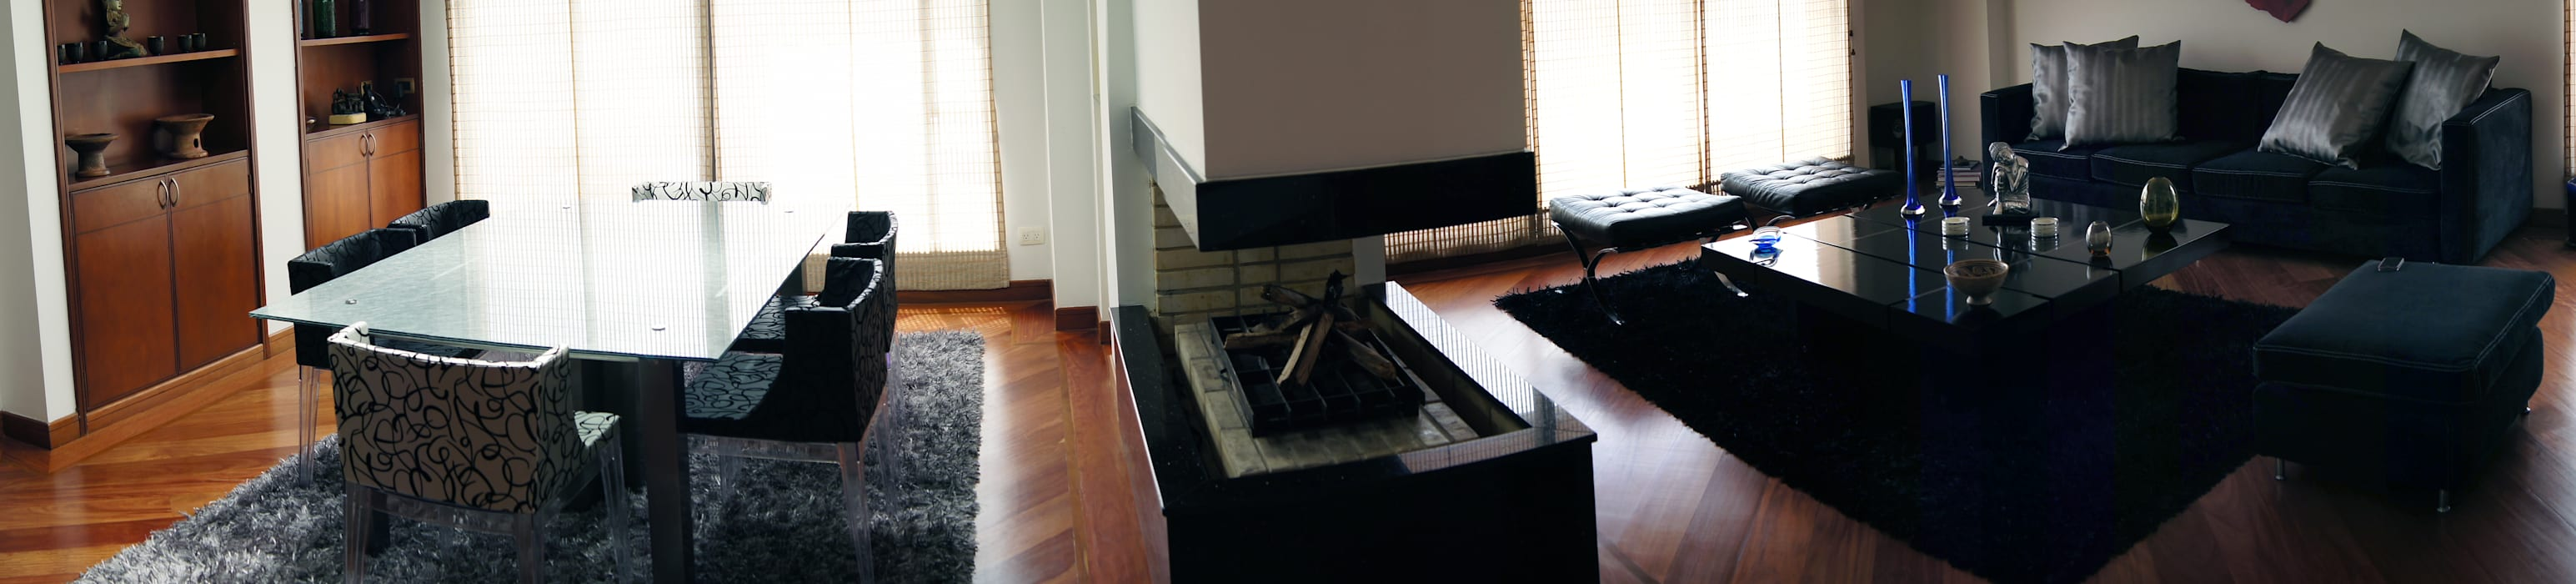 Gentleman Apartament ( apartamento para hombre soltero) Comedores de estilo moderno de MARECO DESIGN S.A.S Moderno